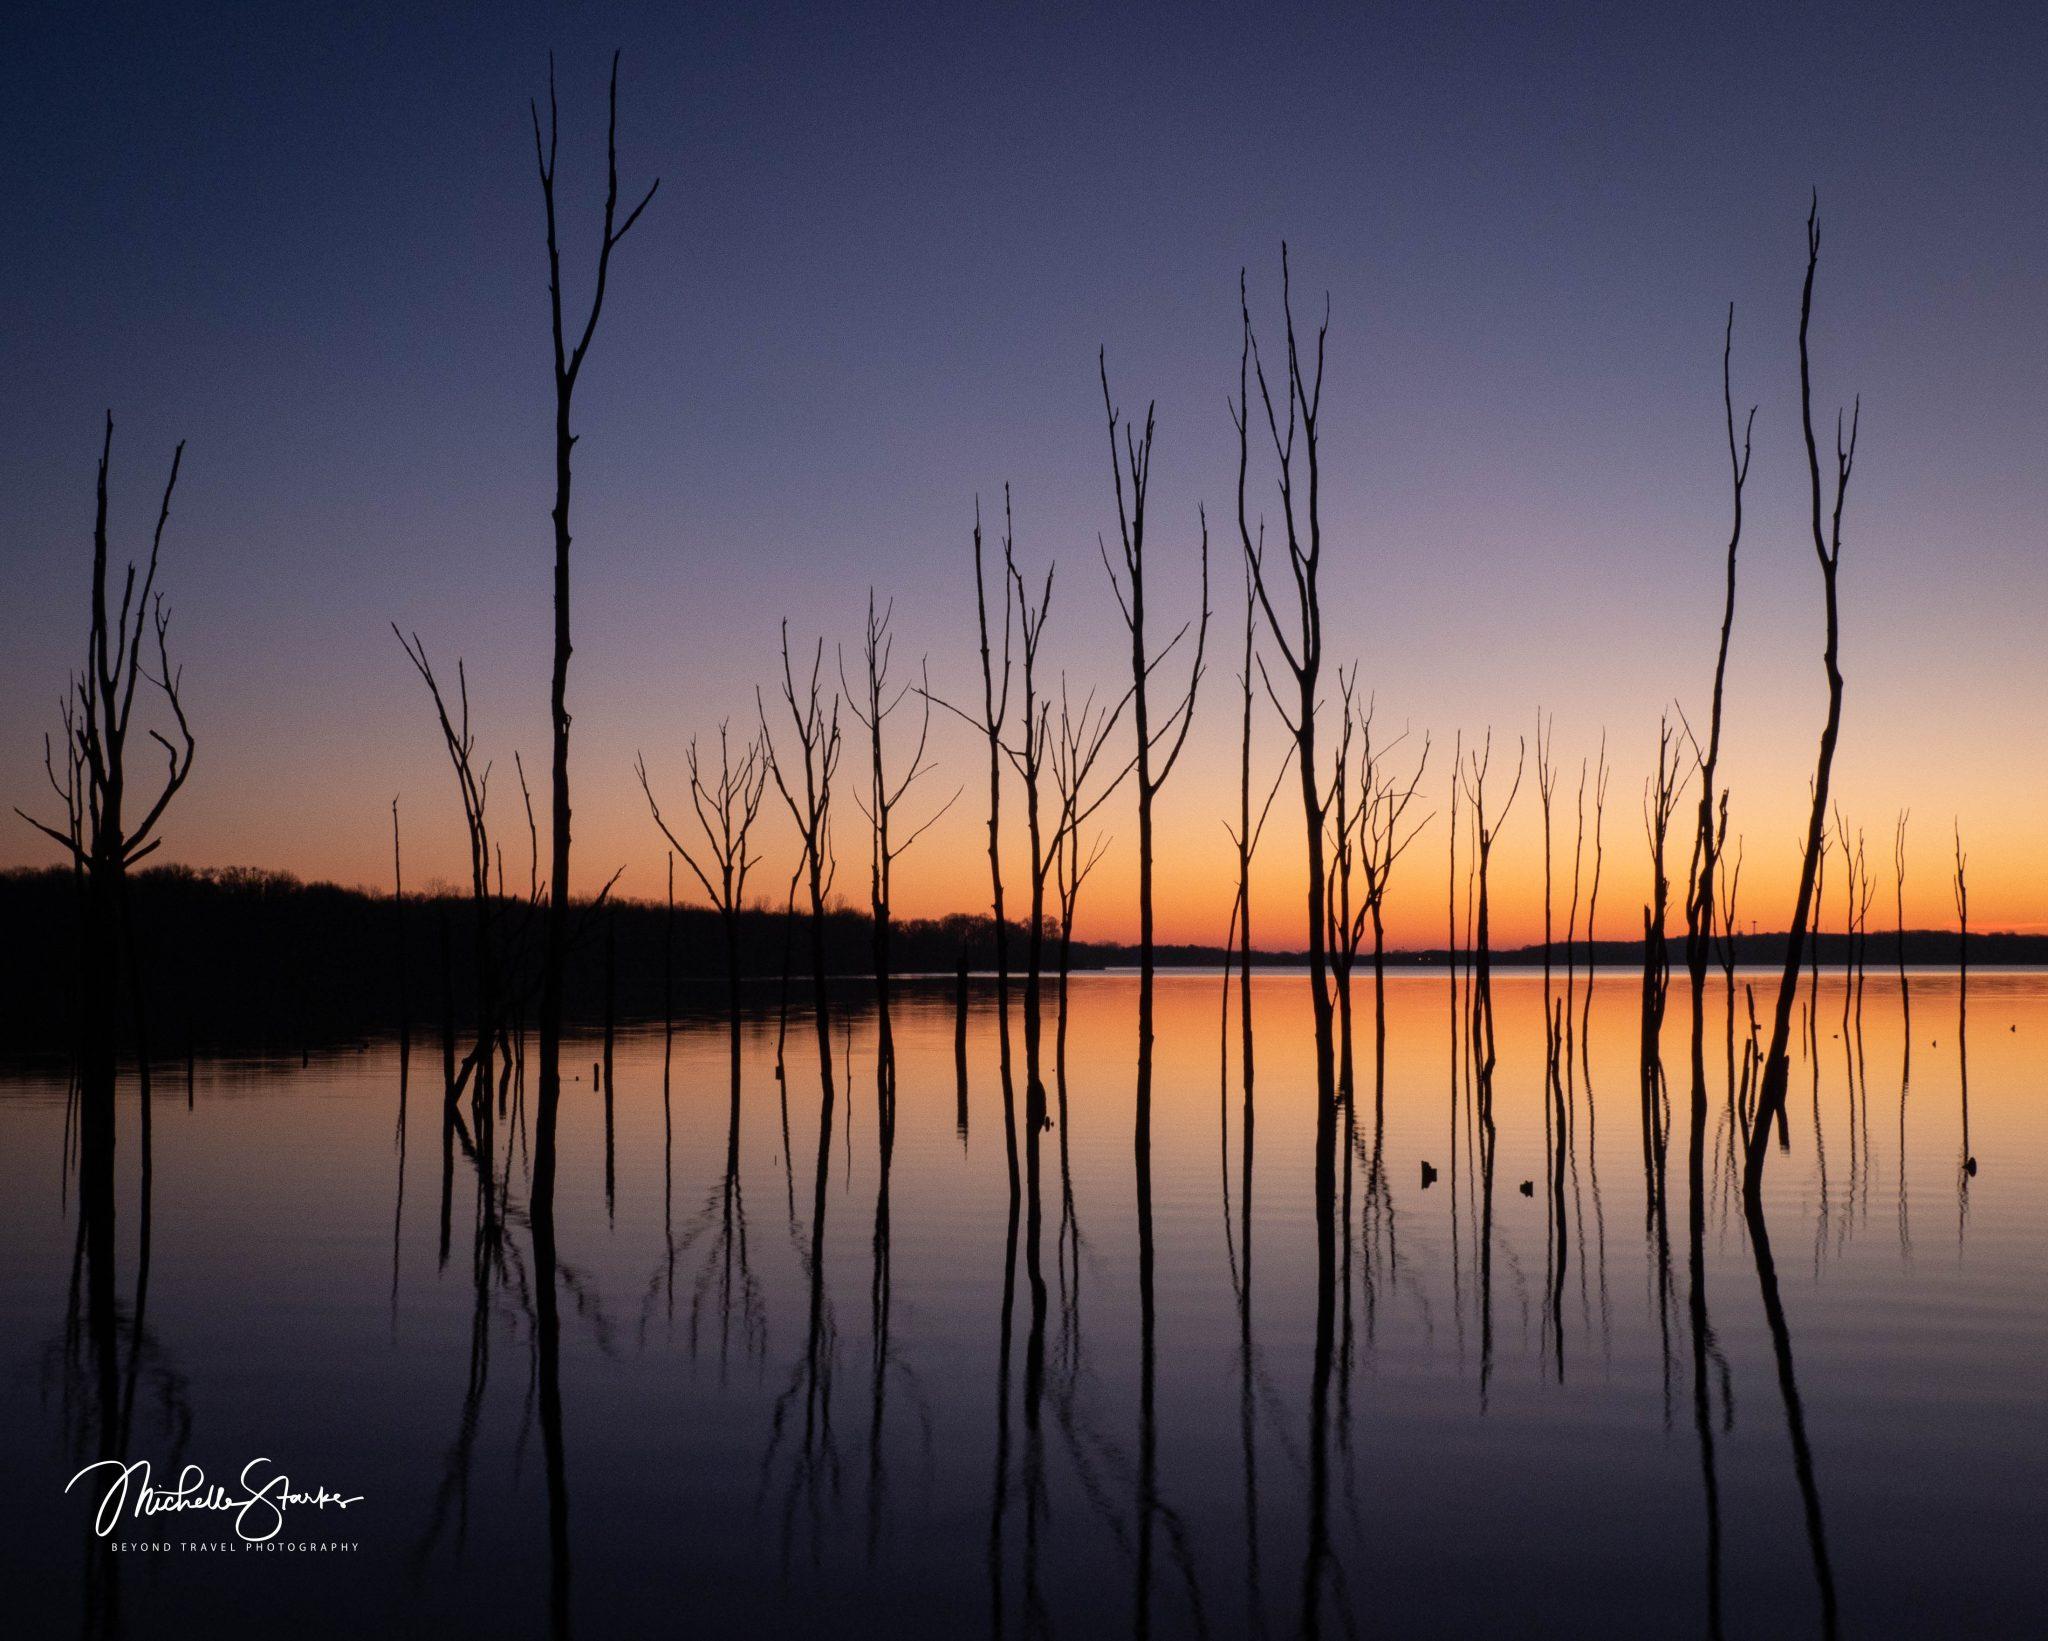 Dead Trees at Sunrise, Manasquan Reservoir, Manasquan, NJ 1/26/20